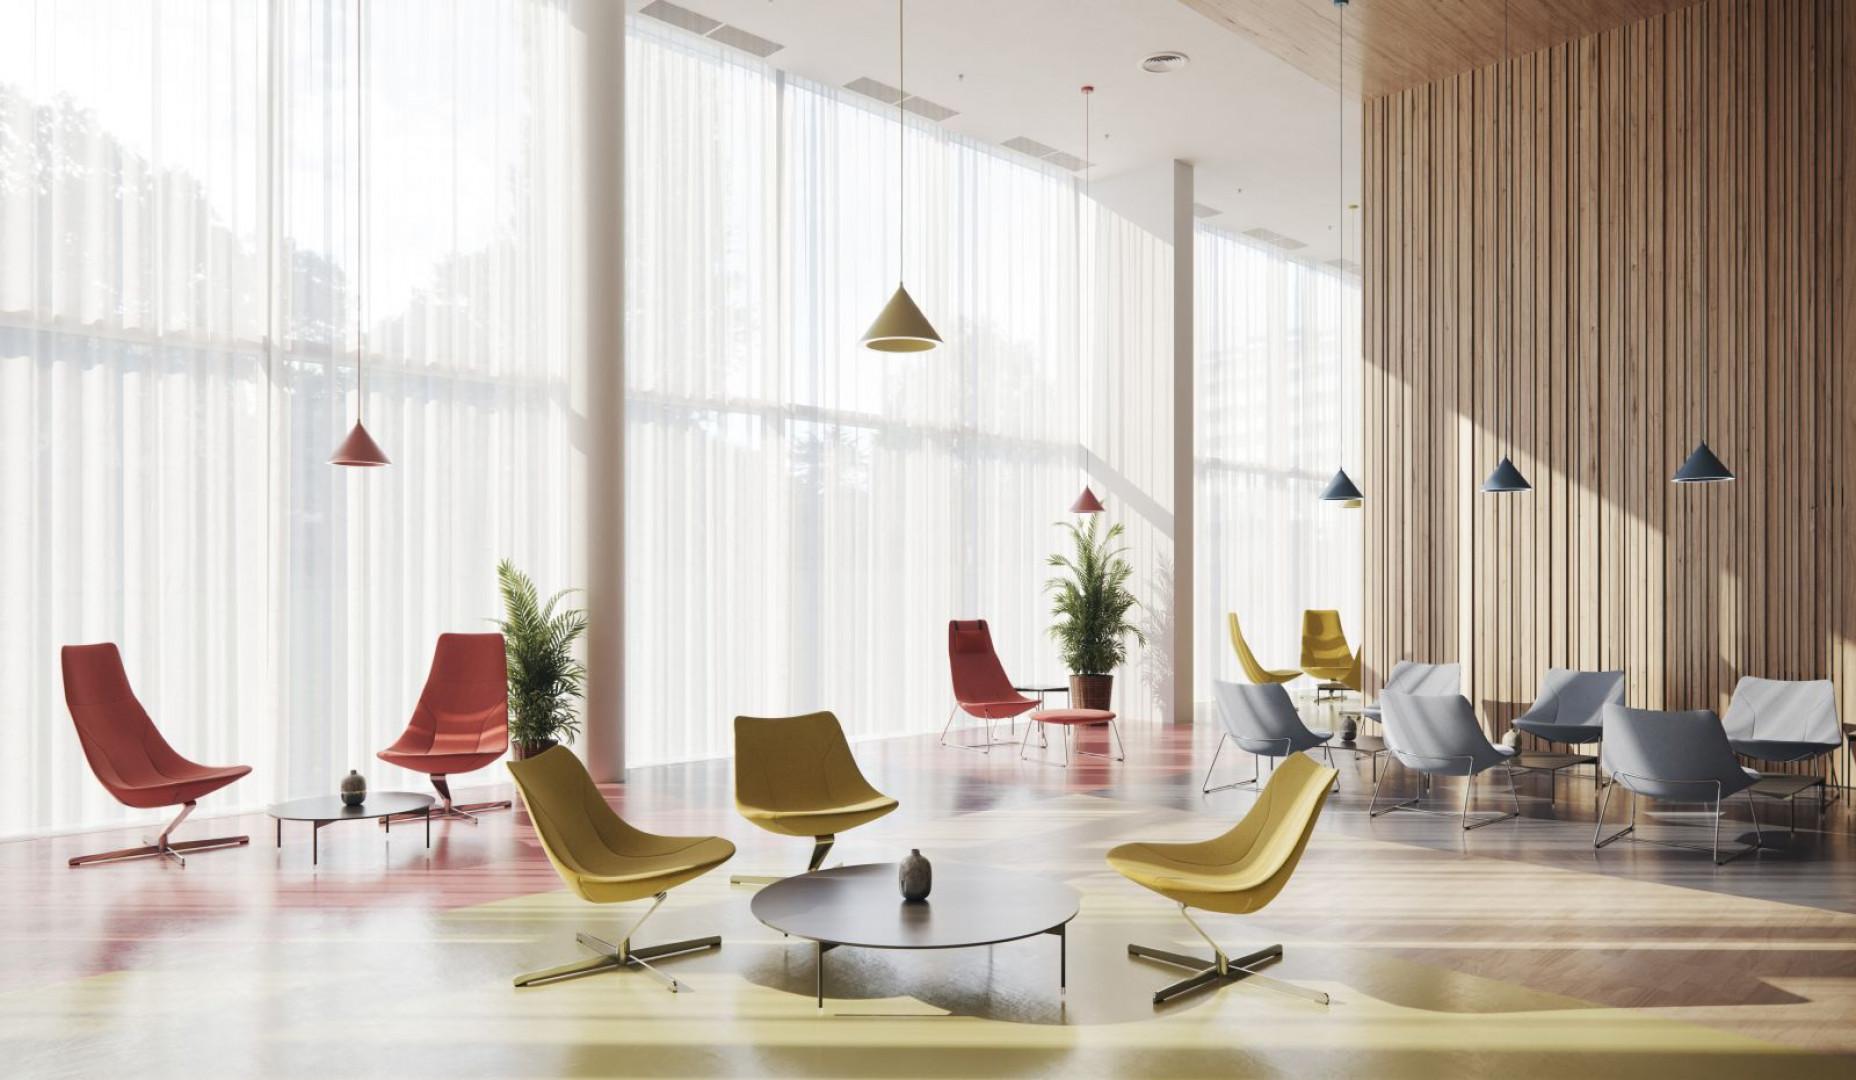 Kolekcja Chic Lounge firmy Profim. Projekt: Christophe Pillet. Fot. Profim